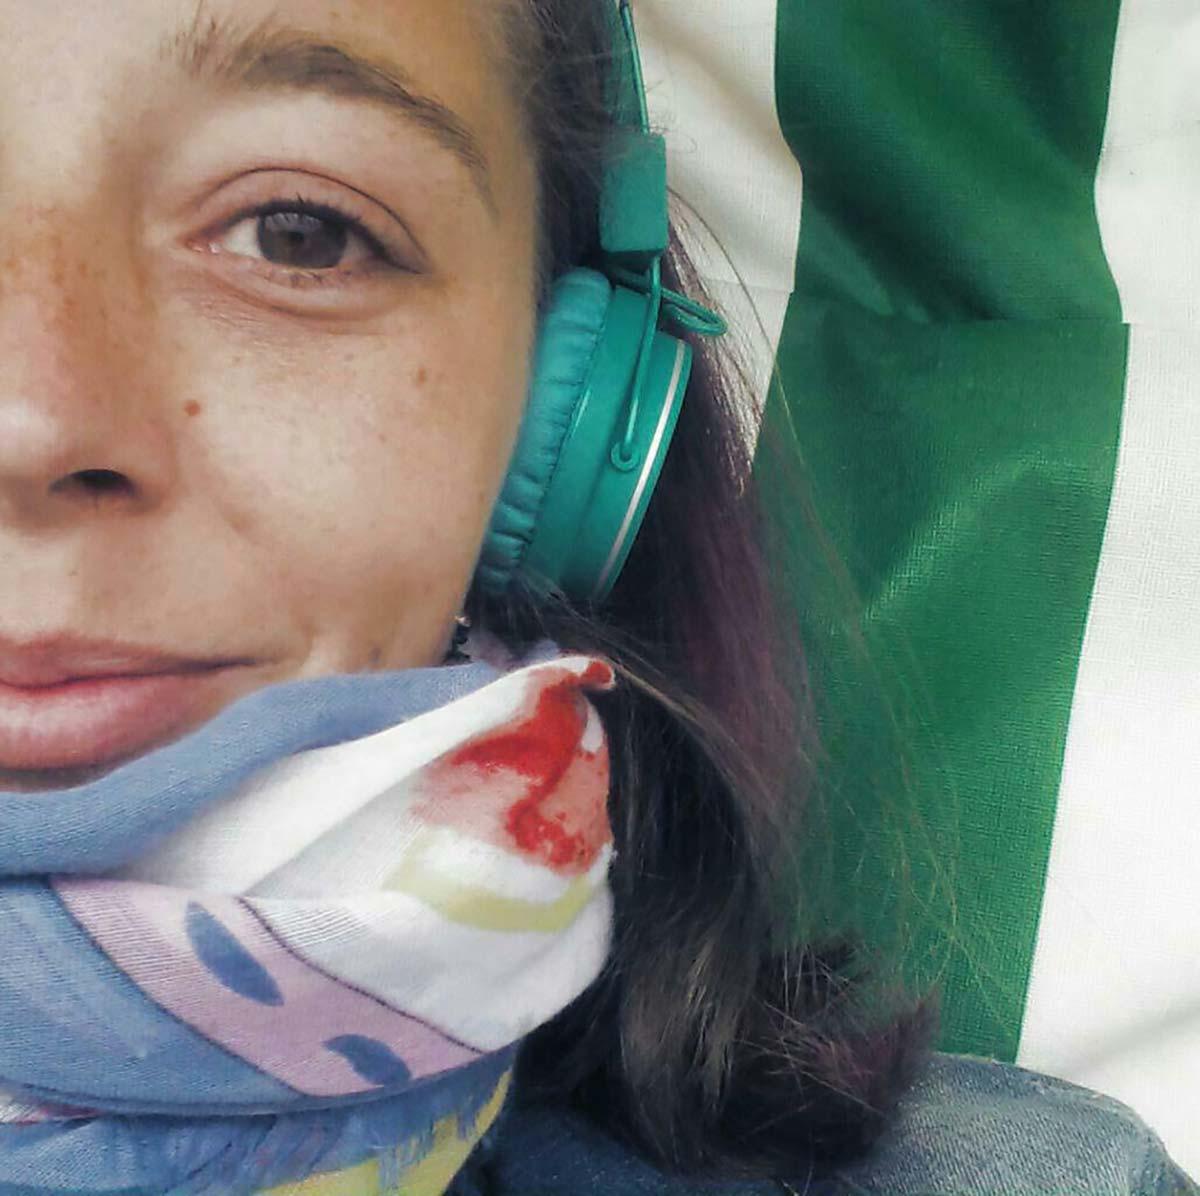 Neue Fetenreporterin für Berlin: Jule (Lola Rennt)